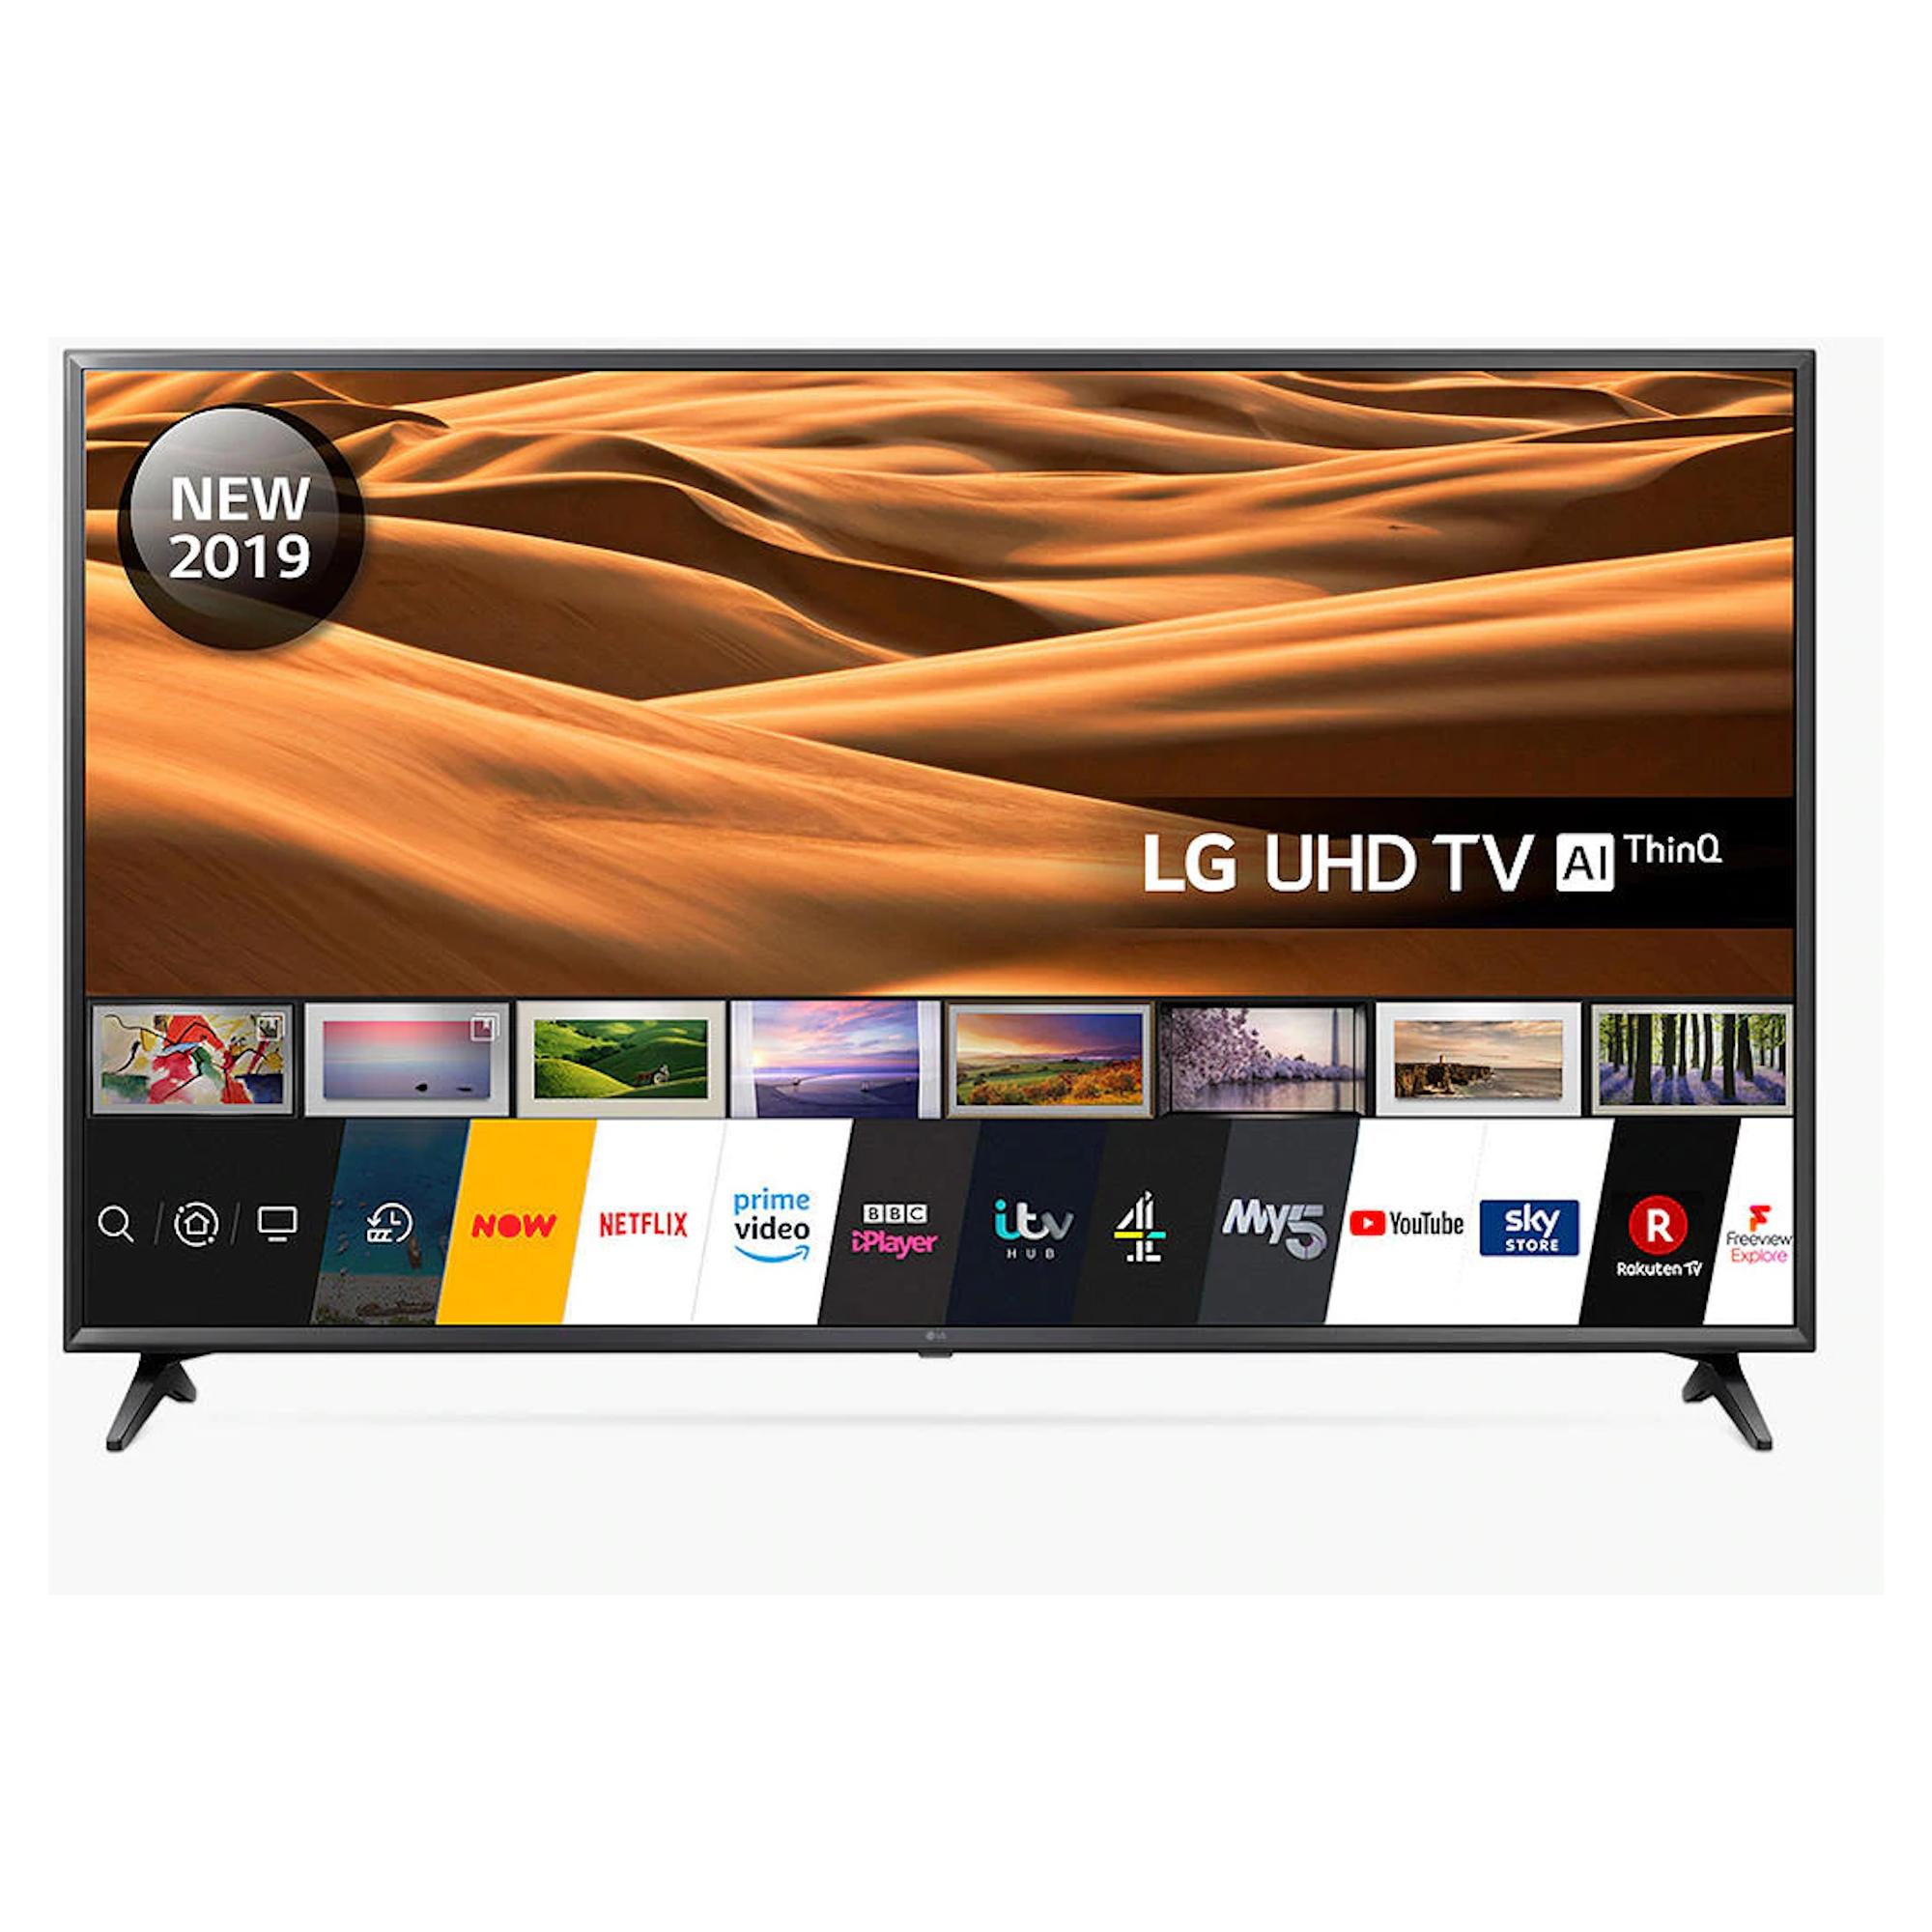 LG 65UM7100PLA 65 4K Ultra HD Smart HDR LED TV £539 @ Ebay/Hughes